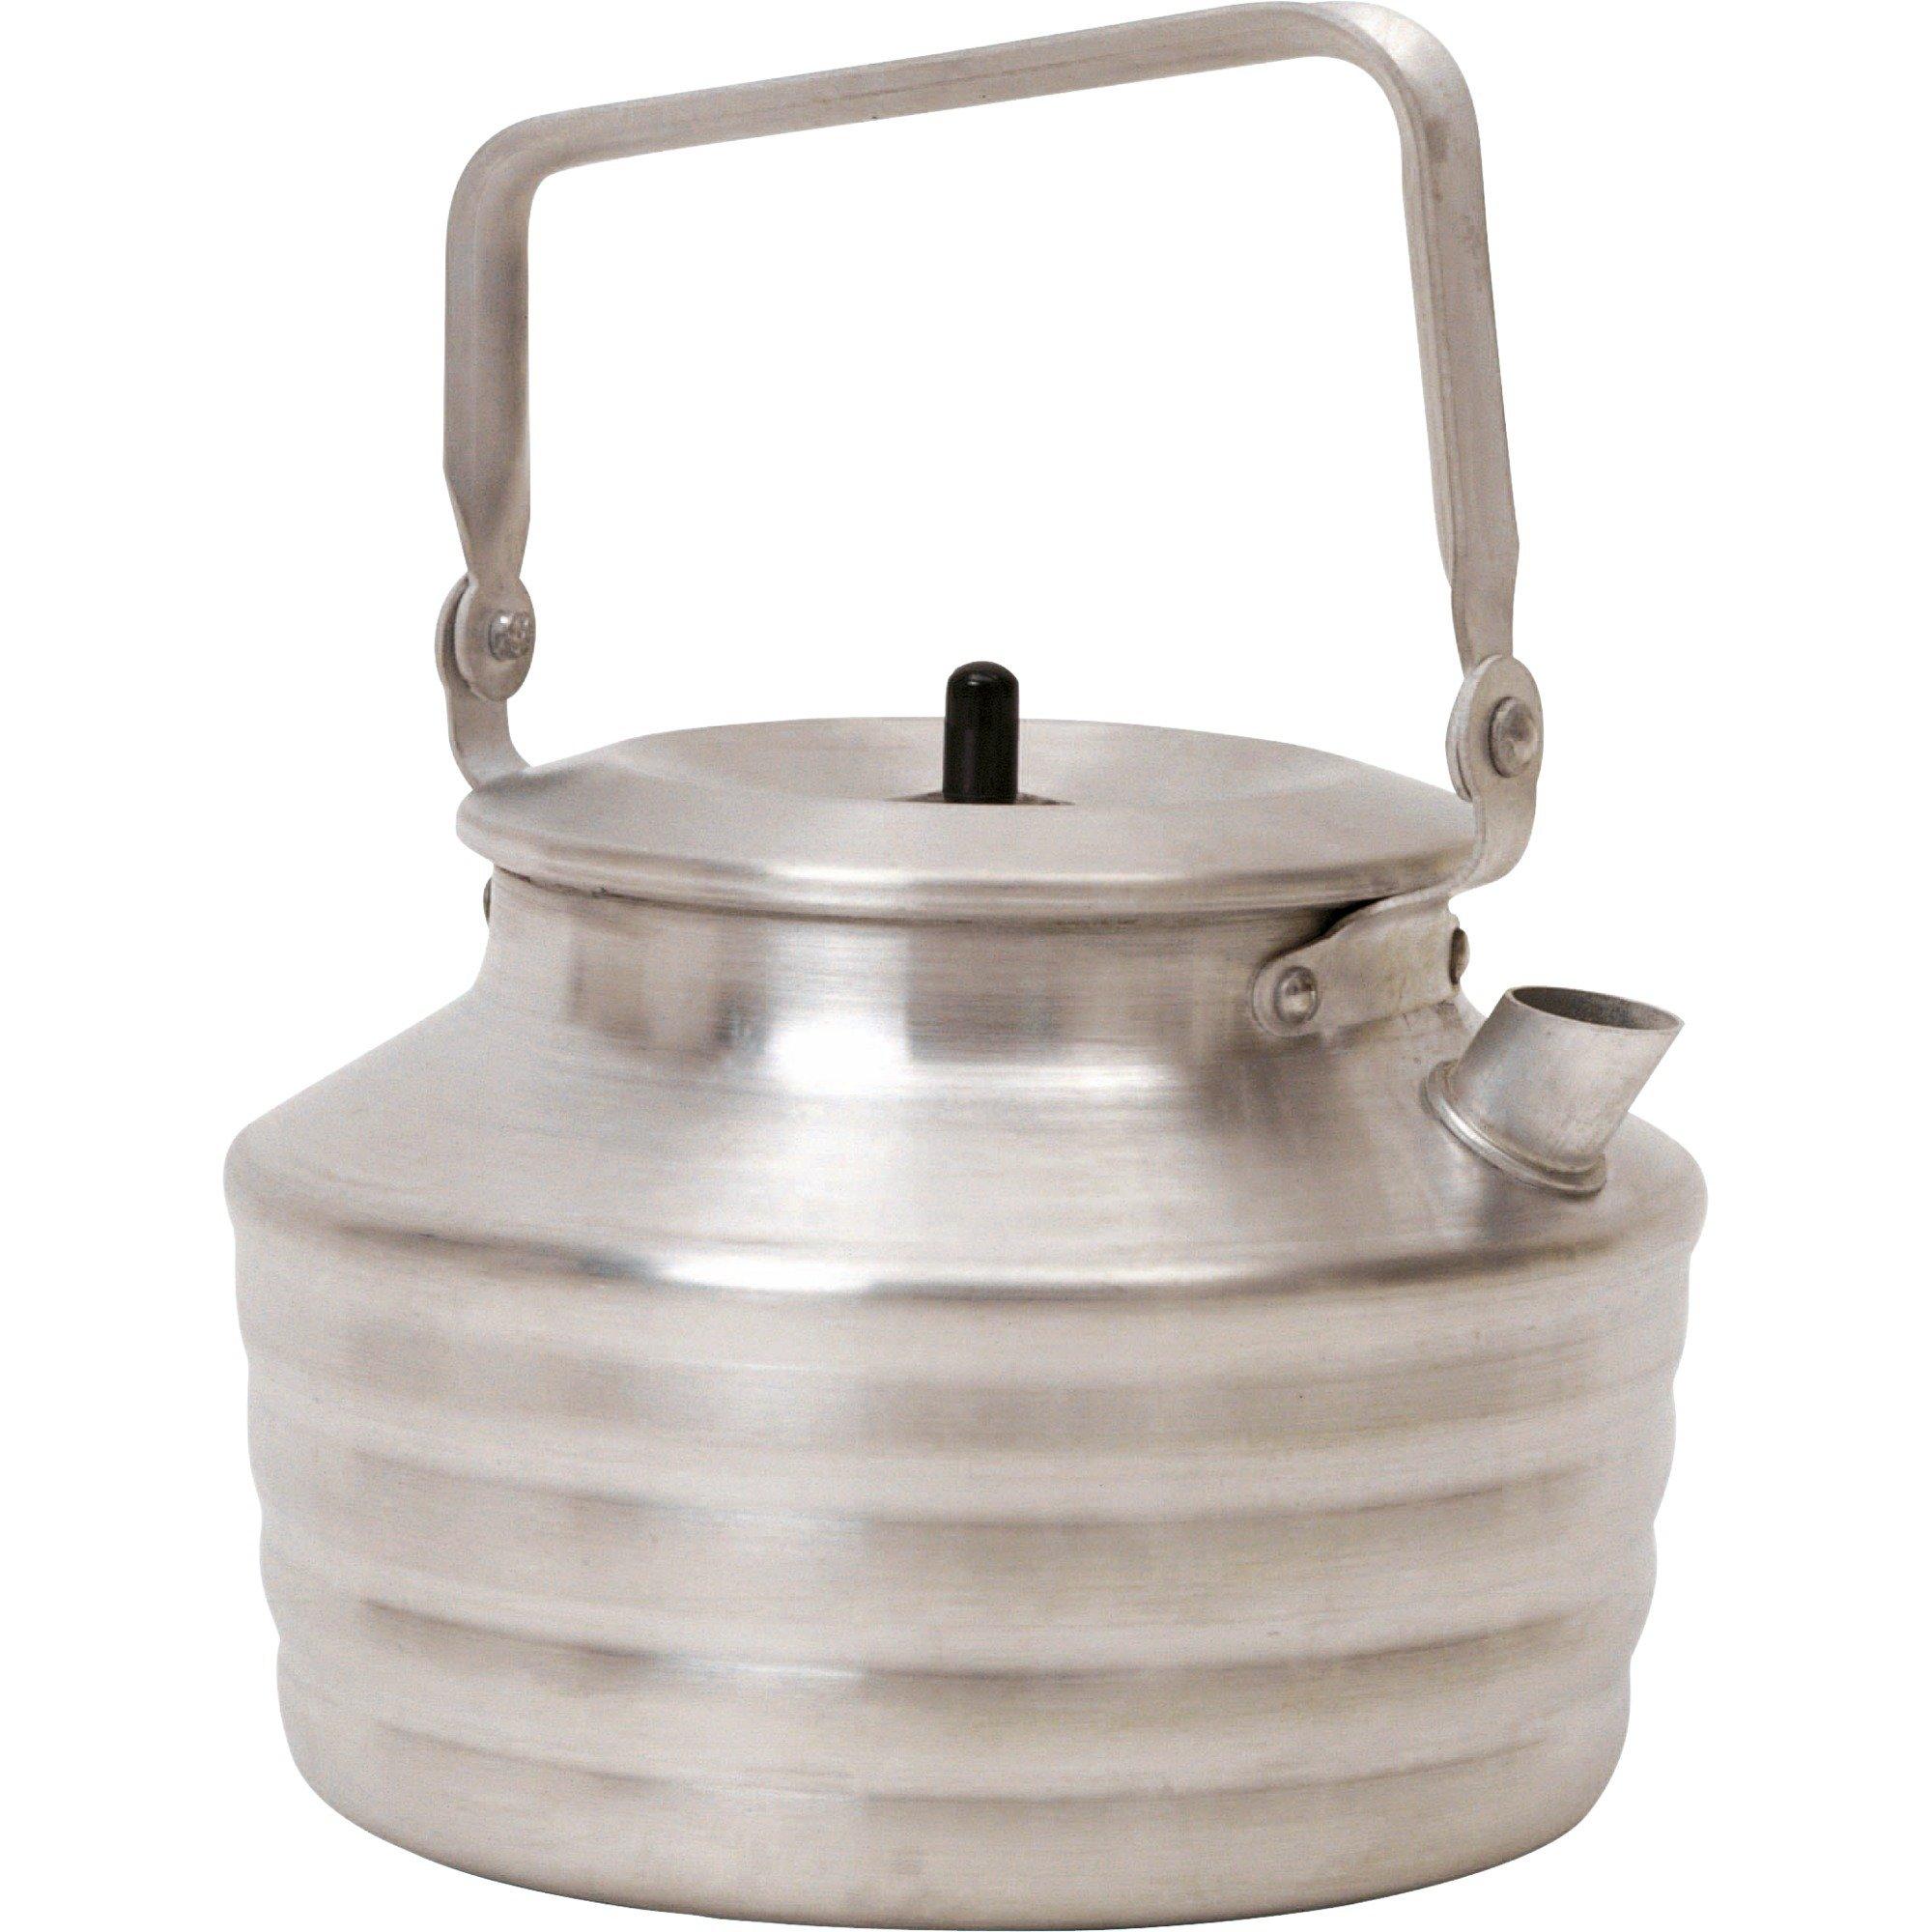 202027 utensilio de cocina para camping Tetera 1,3 L Aluminio, Olla